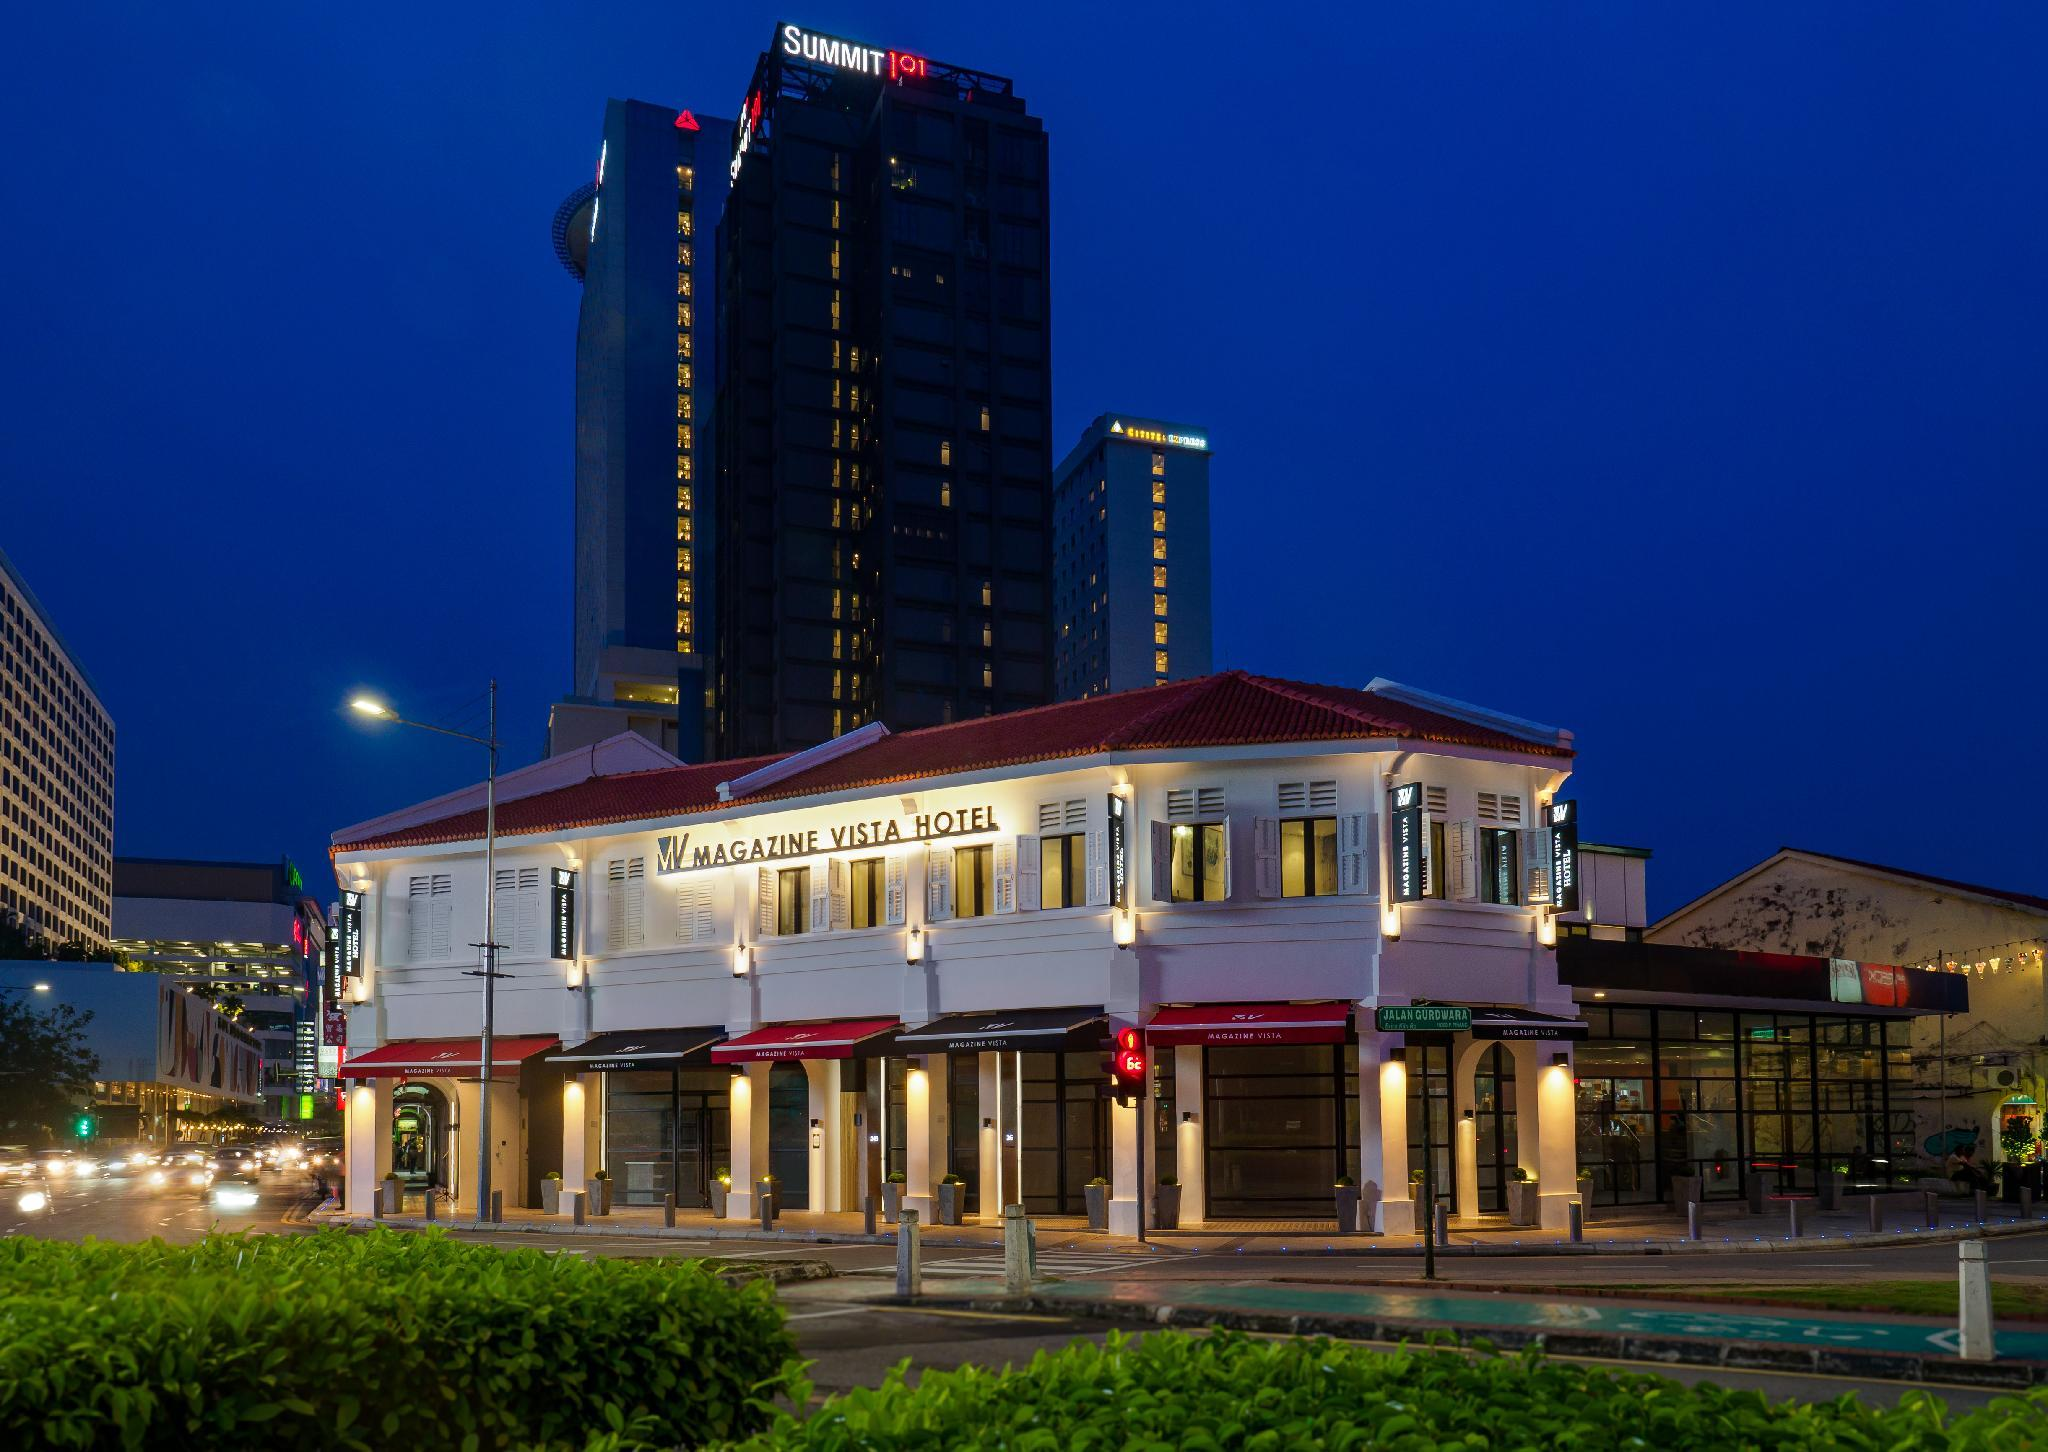 Magazine Vista Hotel By PHC